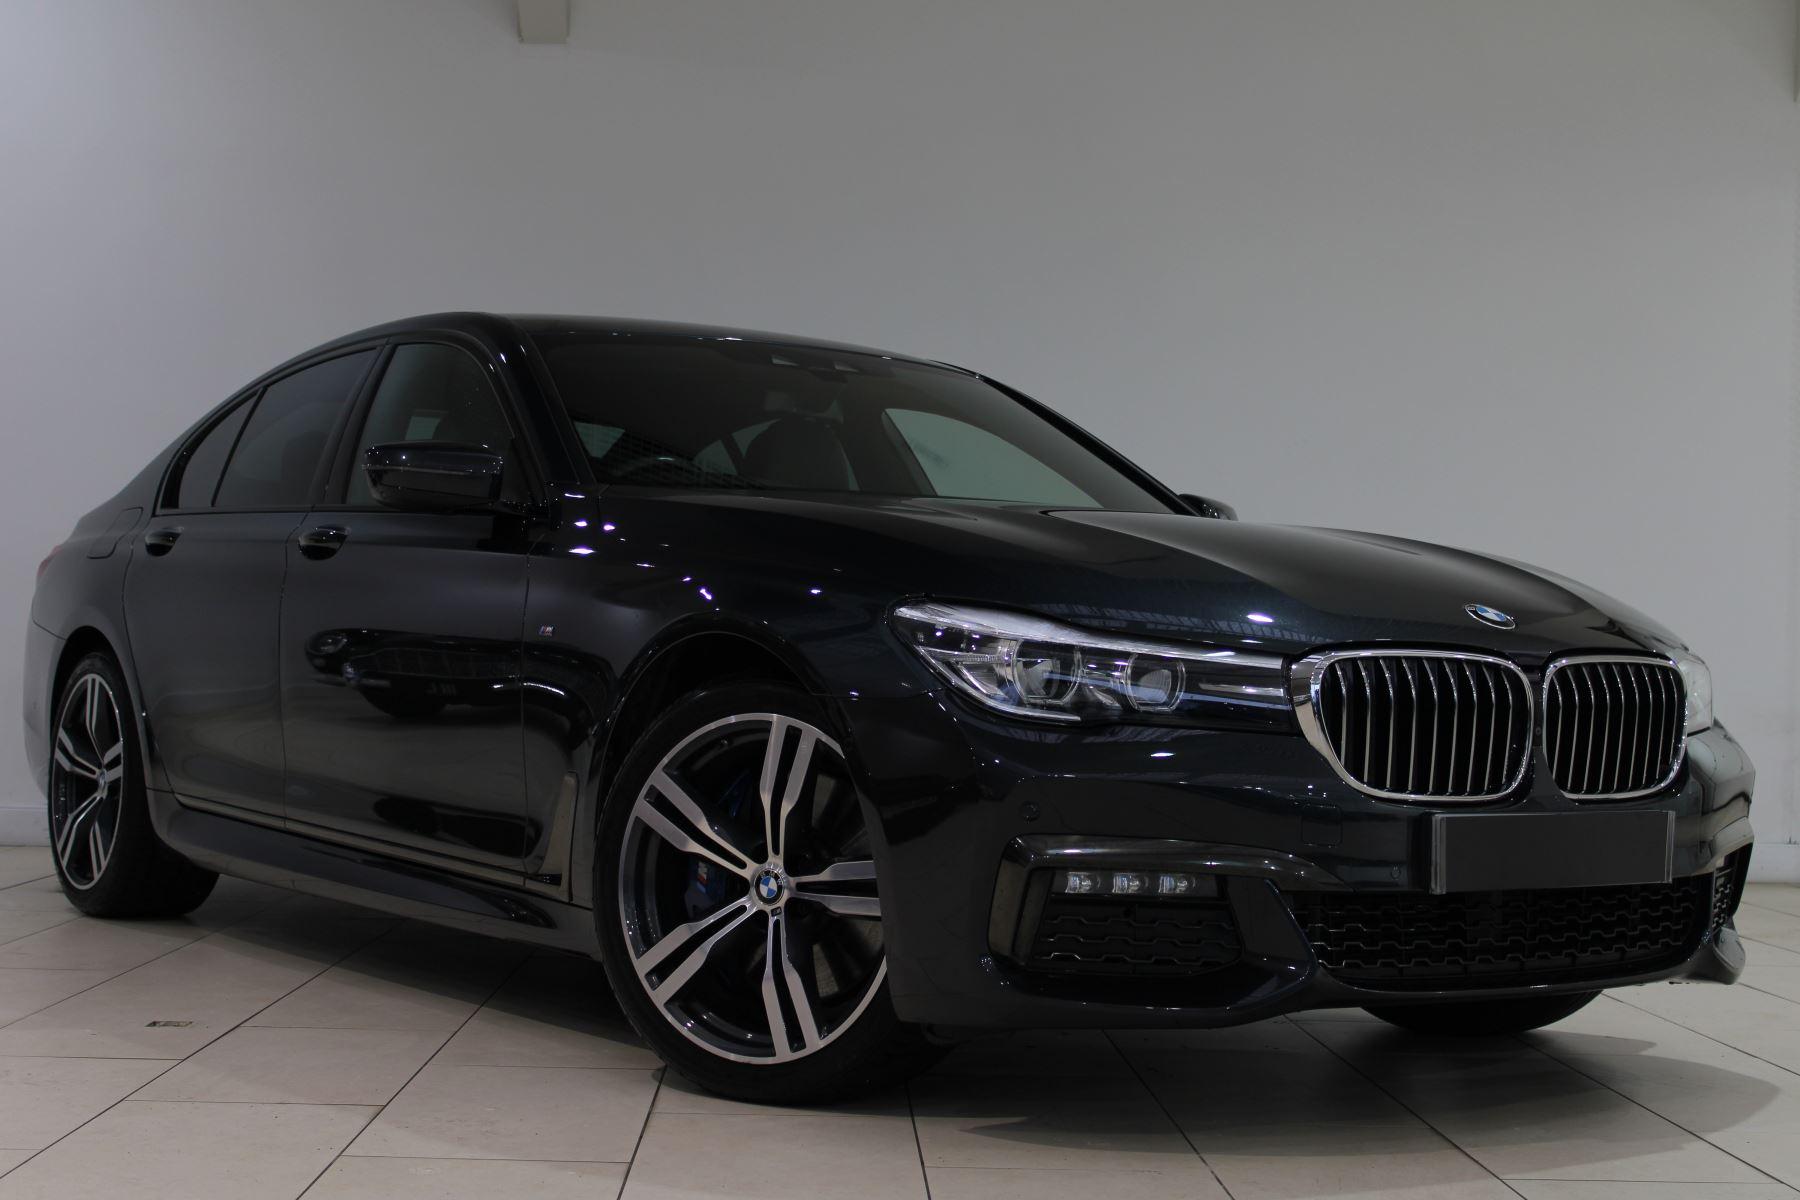 BMW 7 Series 740d xDrive M Sport 3.0 Diesel Automatic 4 door Saloon (2019)